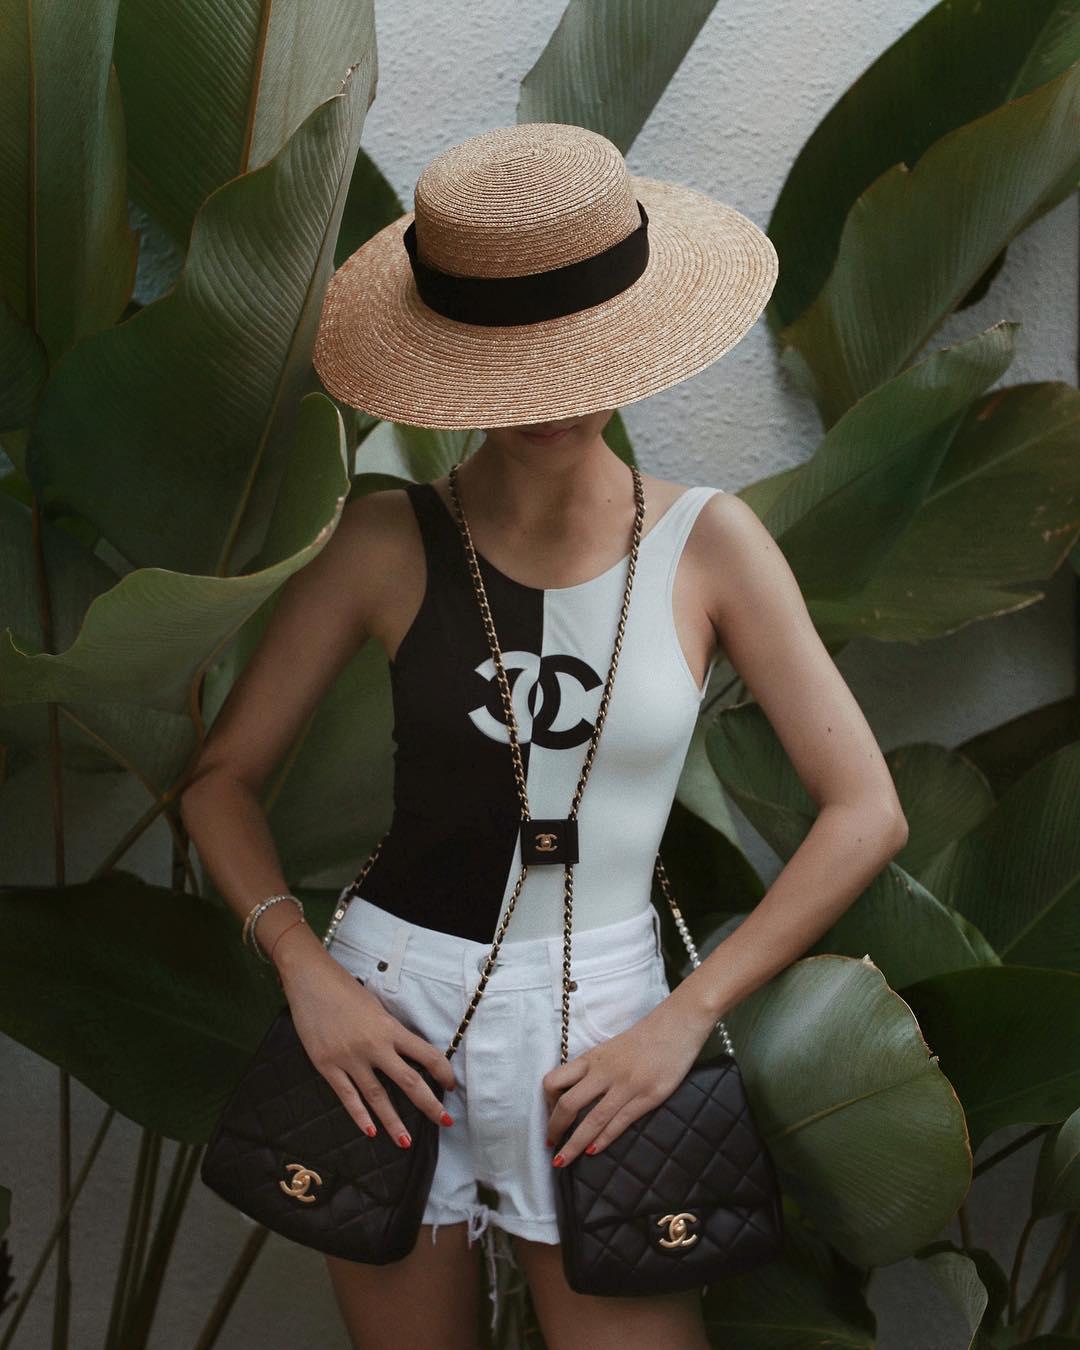 Yoyo Cao mặc bodysuit Chanel trắng đen